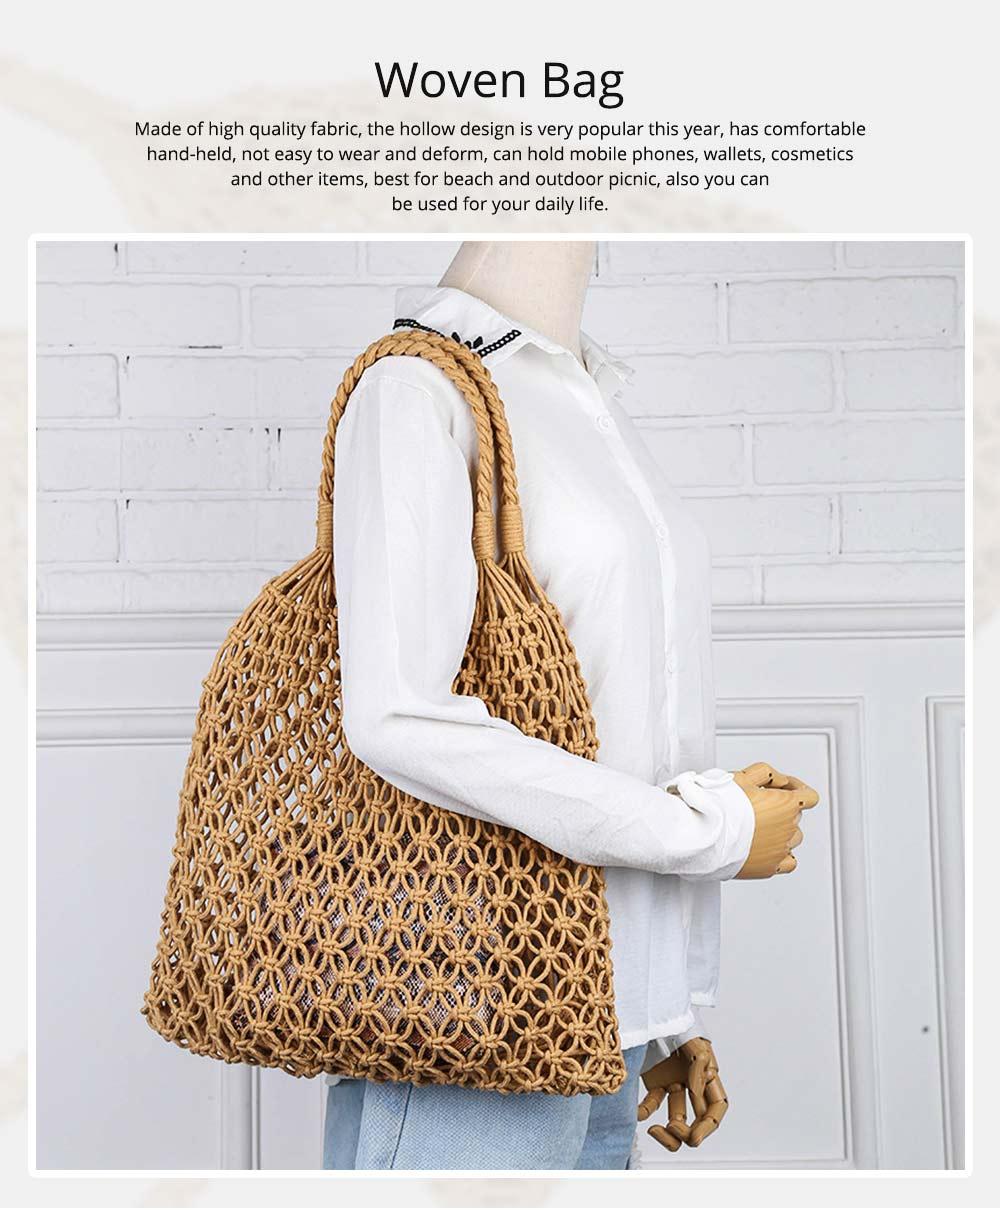 Handmade Woven Bag for Women, Rope Hollow Mesh Straw Bag, Beach Single Shoulder Bag Handbag 2019 New 0